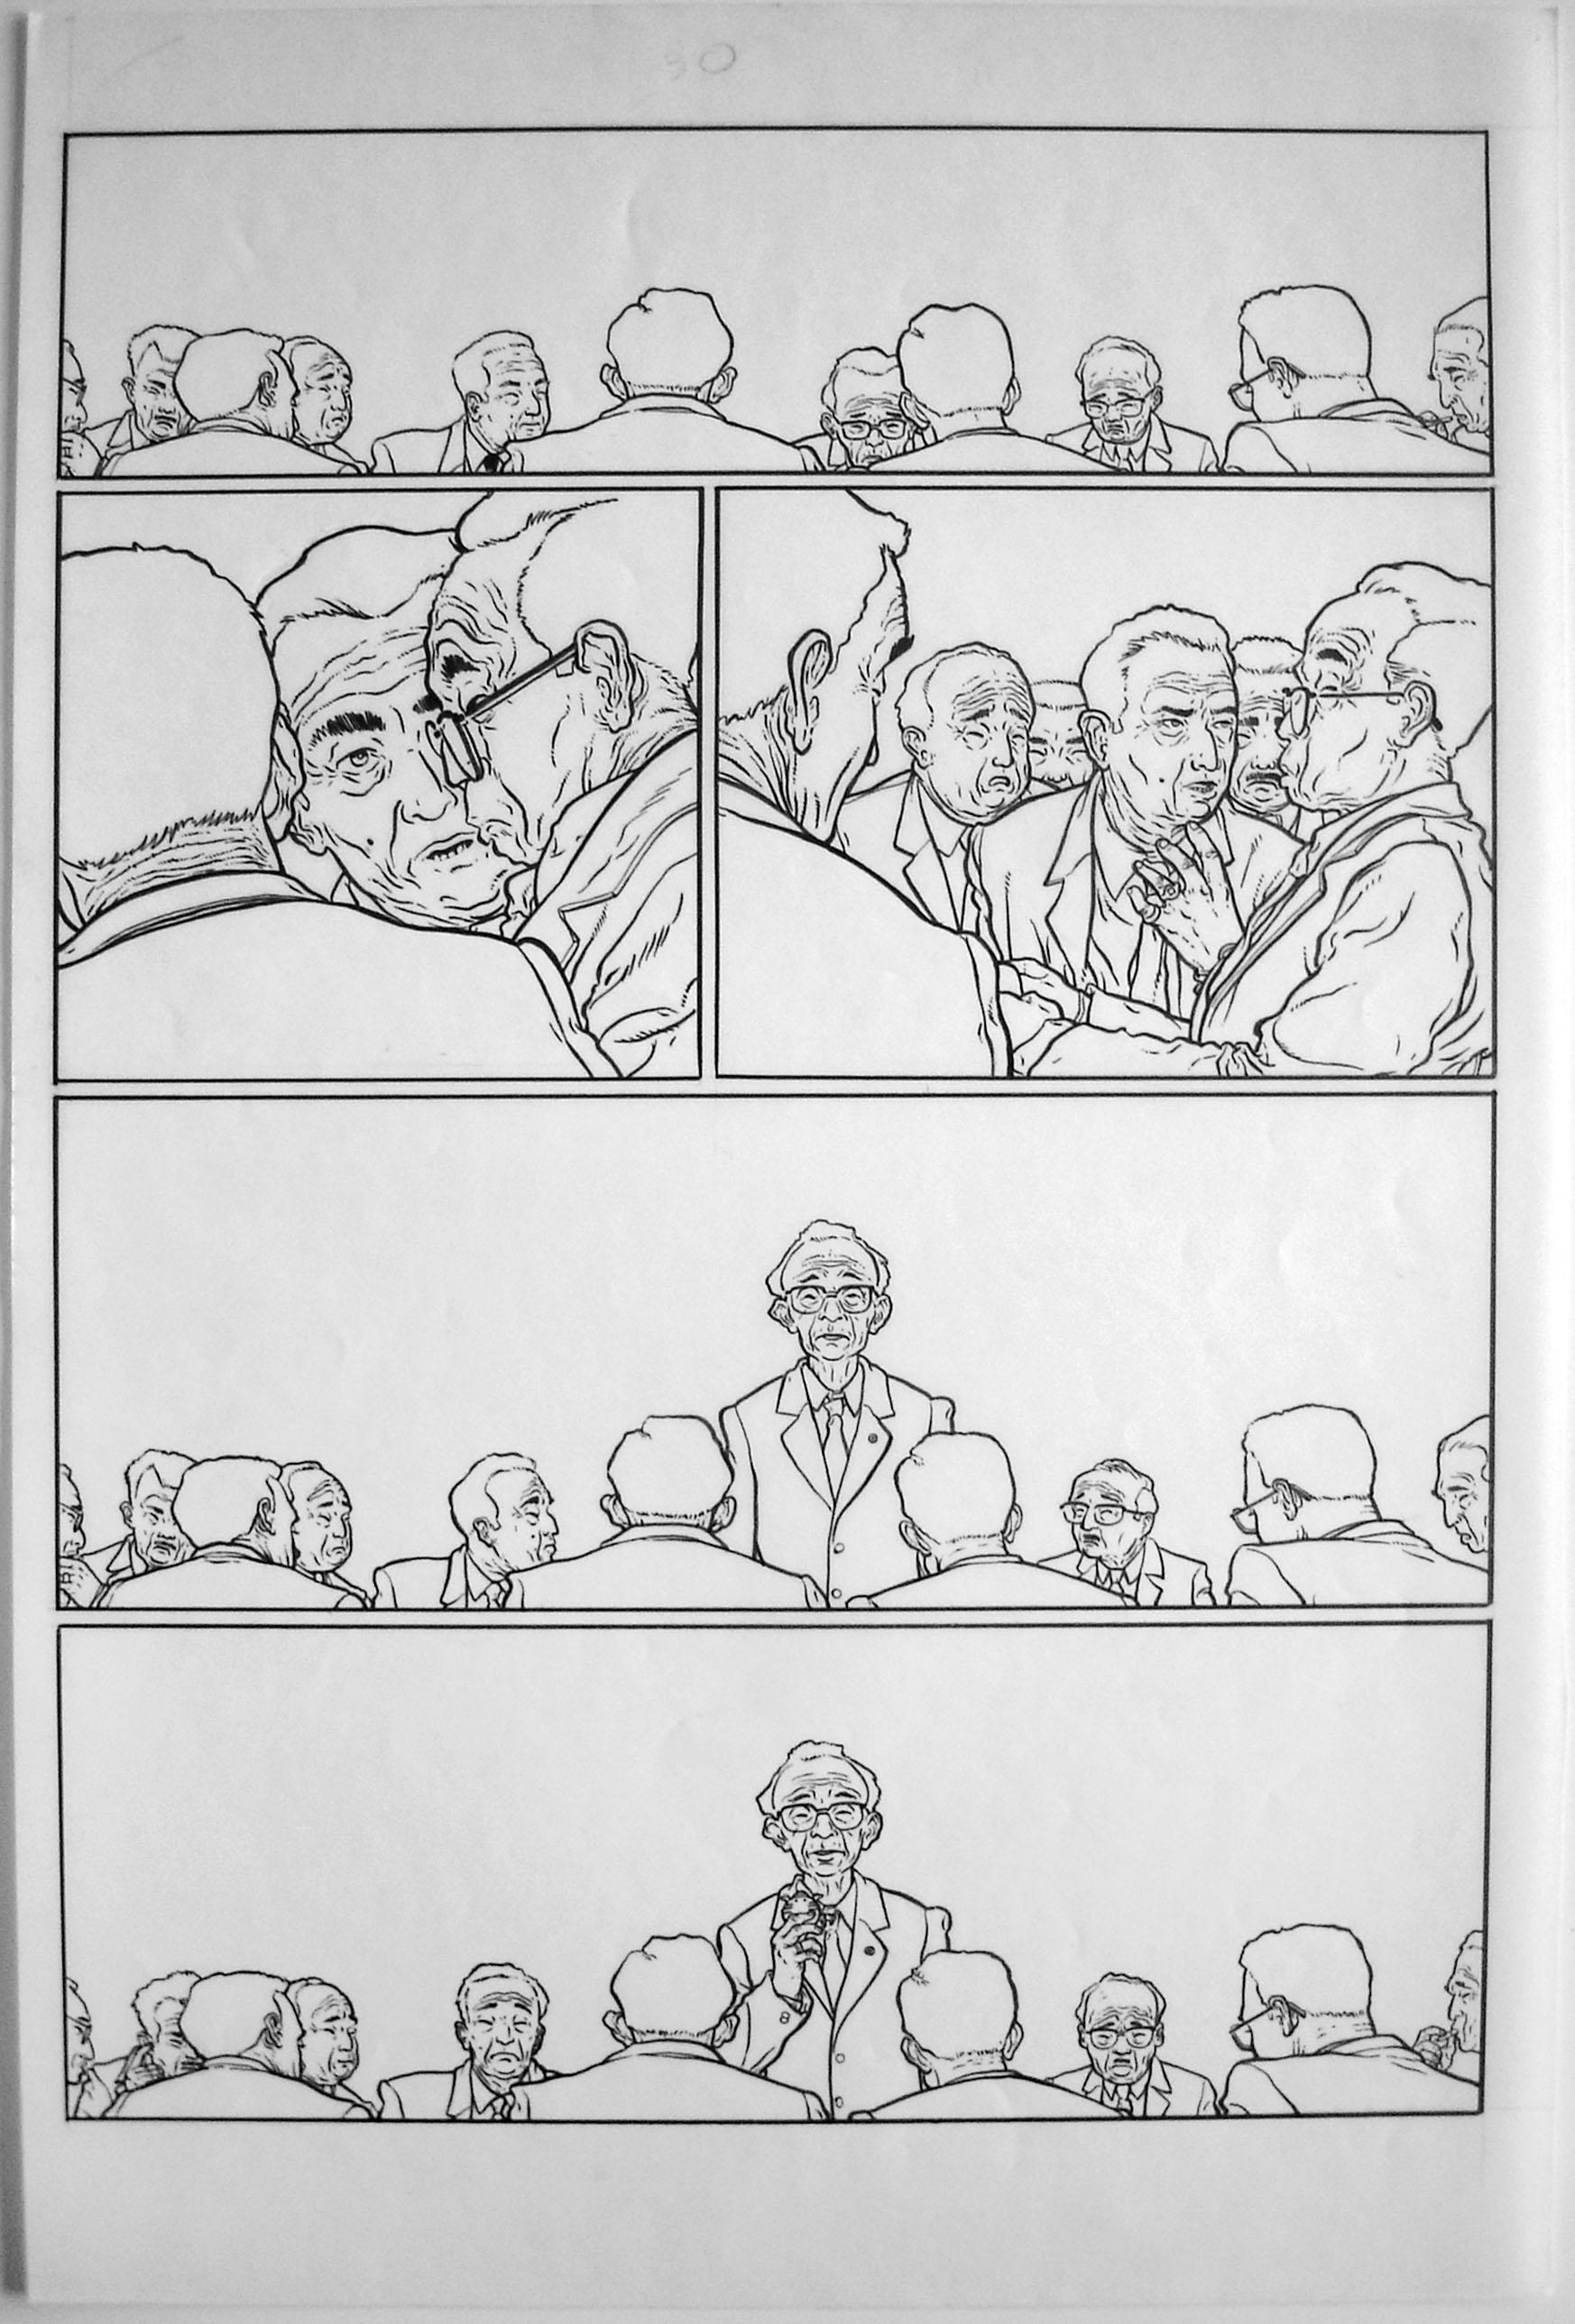 geof-darrow-big-guy-page3.jpg